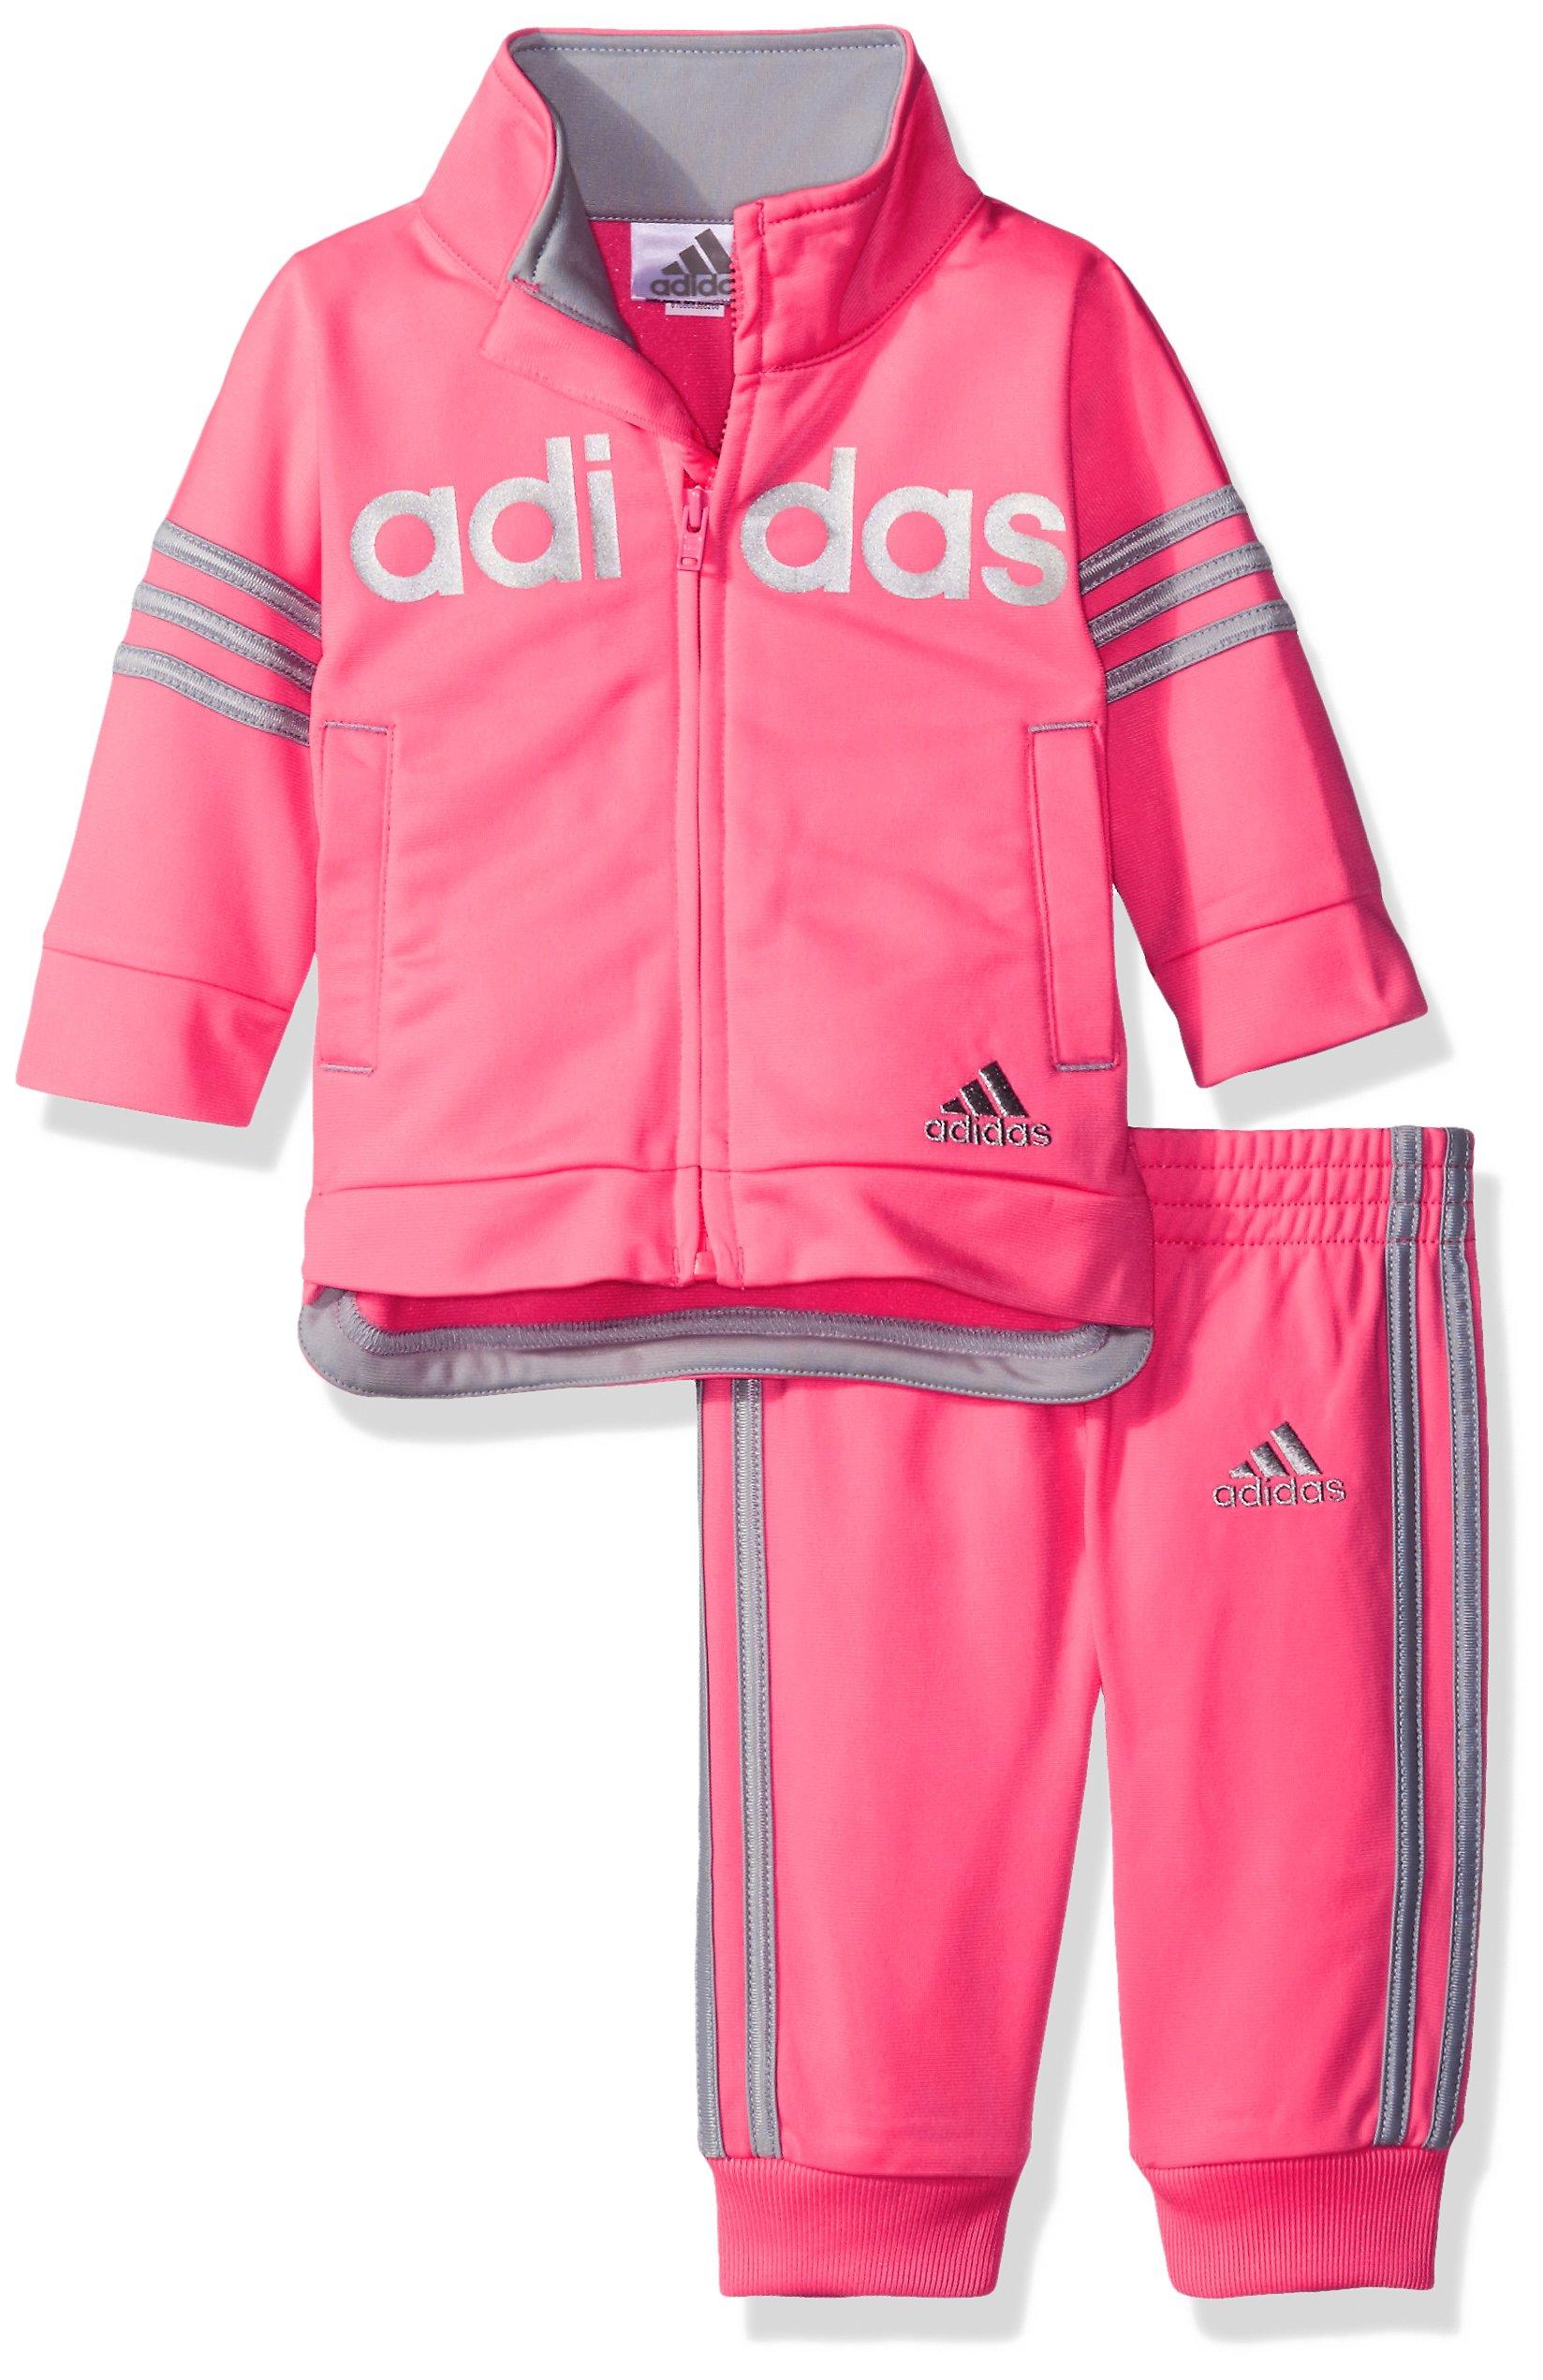 ff17d1c62 Galleon - Adidas Baby Girls' Zip Jacket And Pant Set, Ultra Pop Adidas, 6  Months